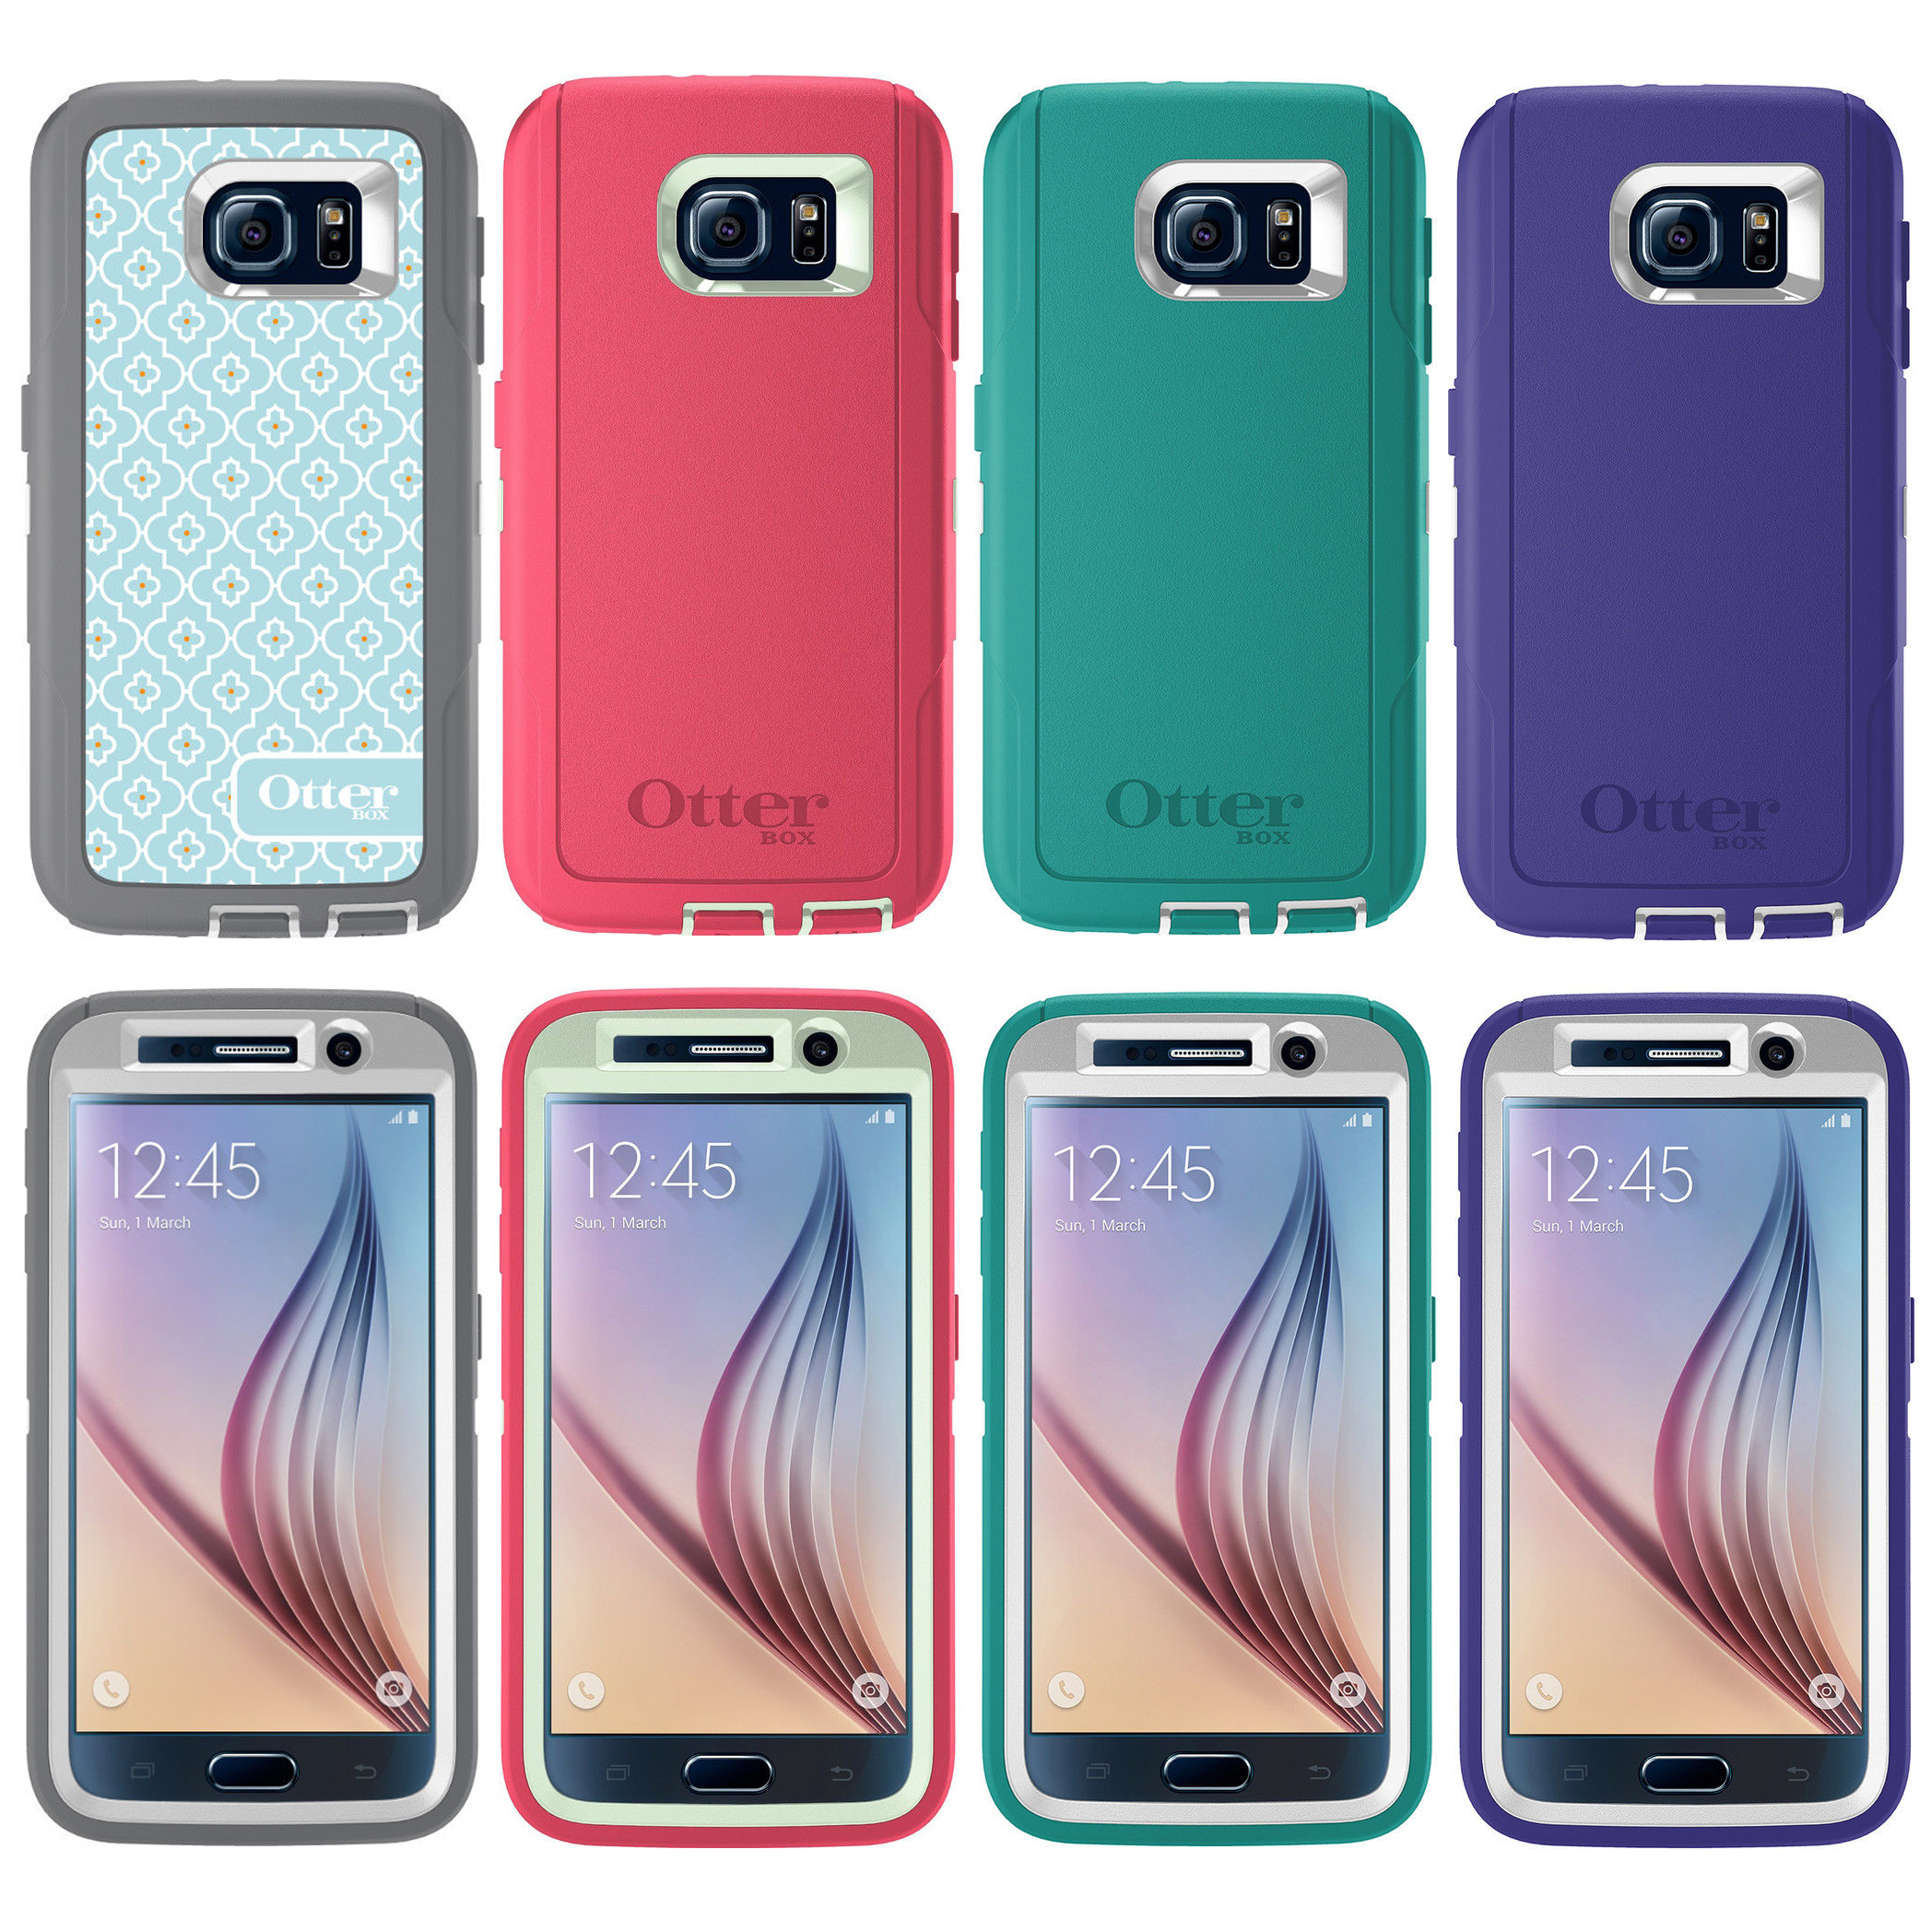 samsung galaxy s6 otterbox case